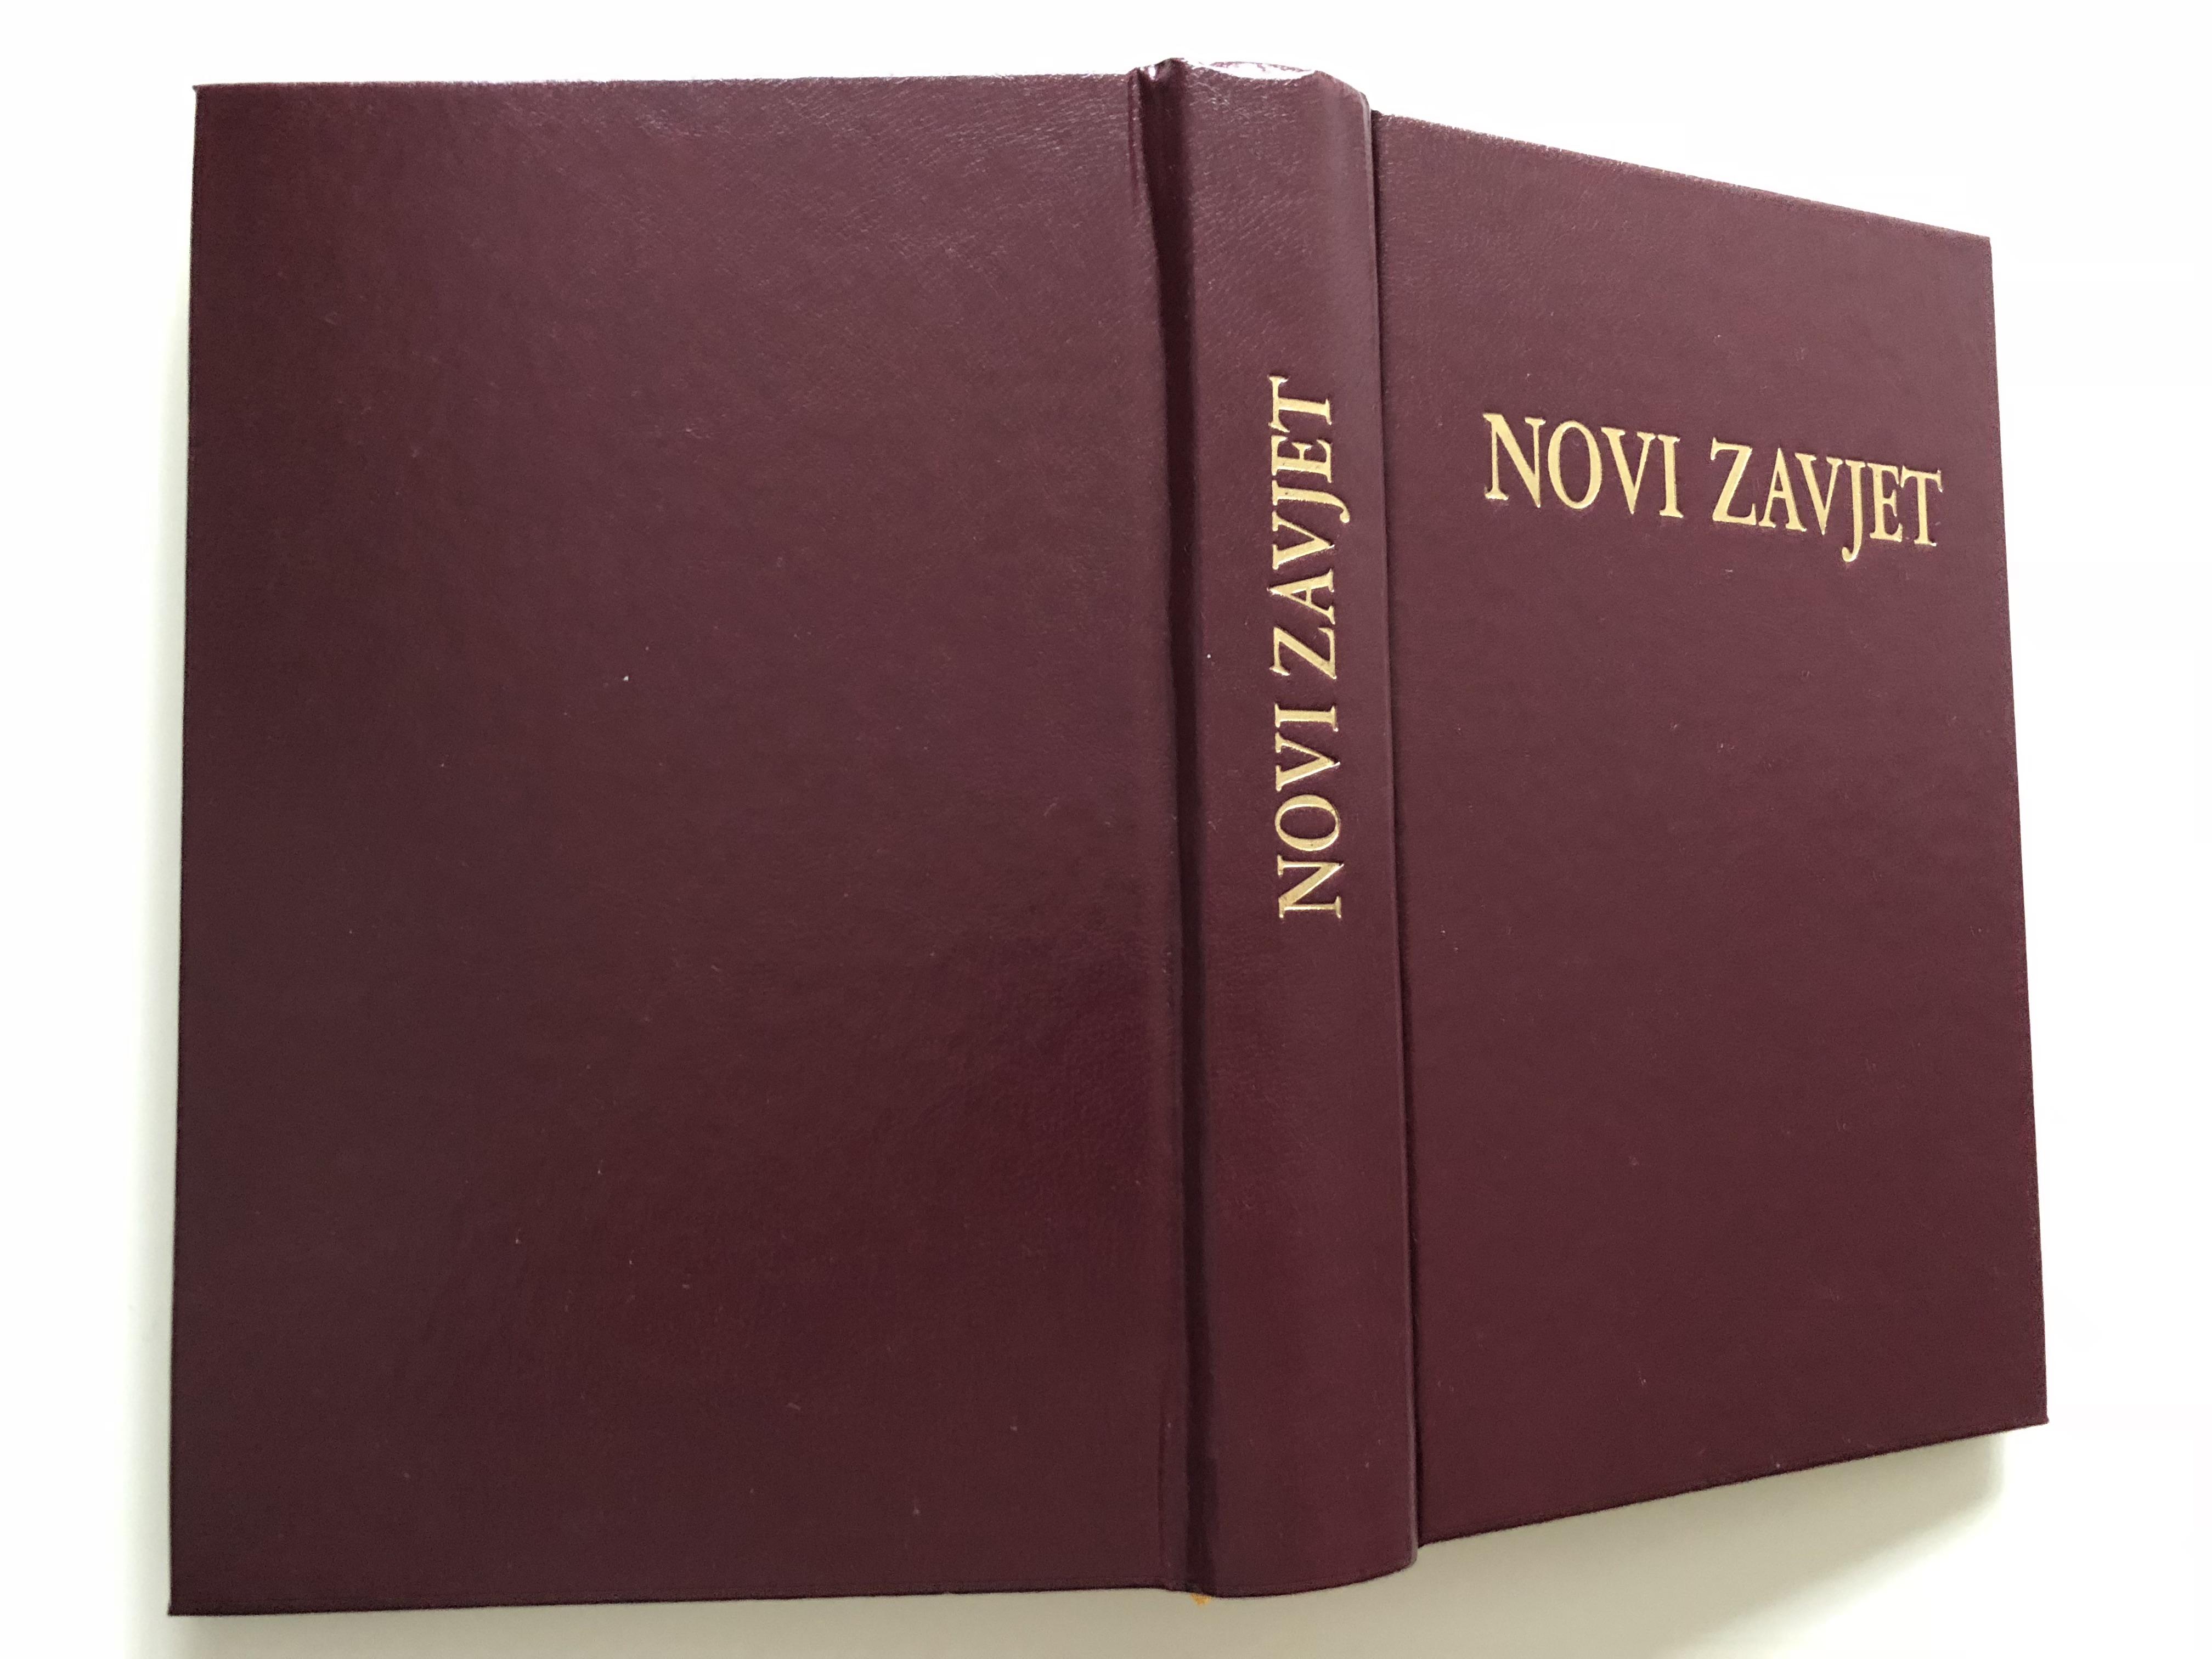 novi-zavjet-the-new-testament-in-croatian-language-hardcover-burgundy-hbd-2013-13-.jpg